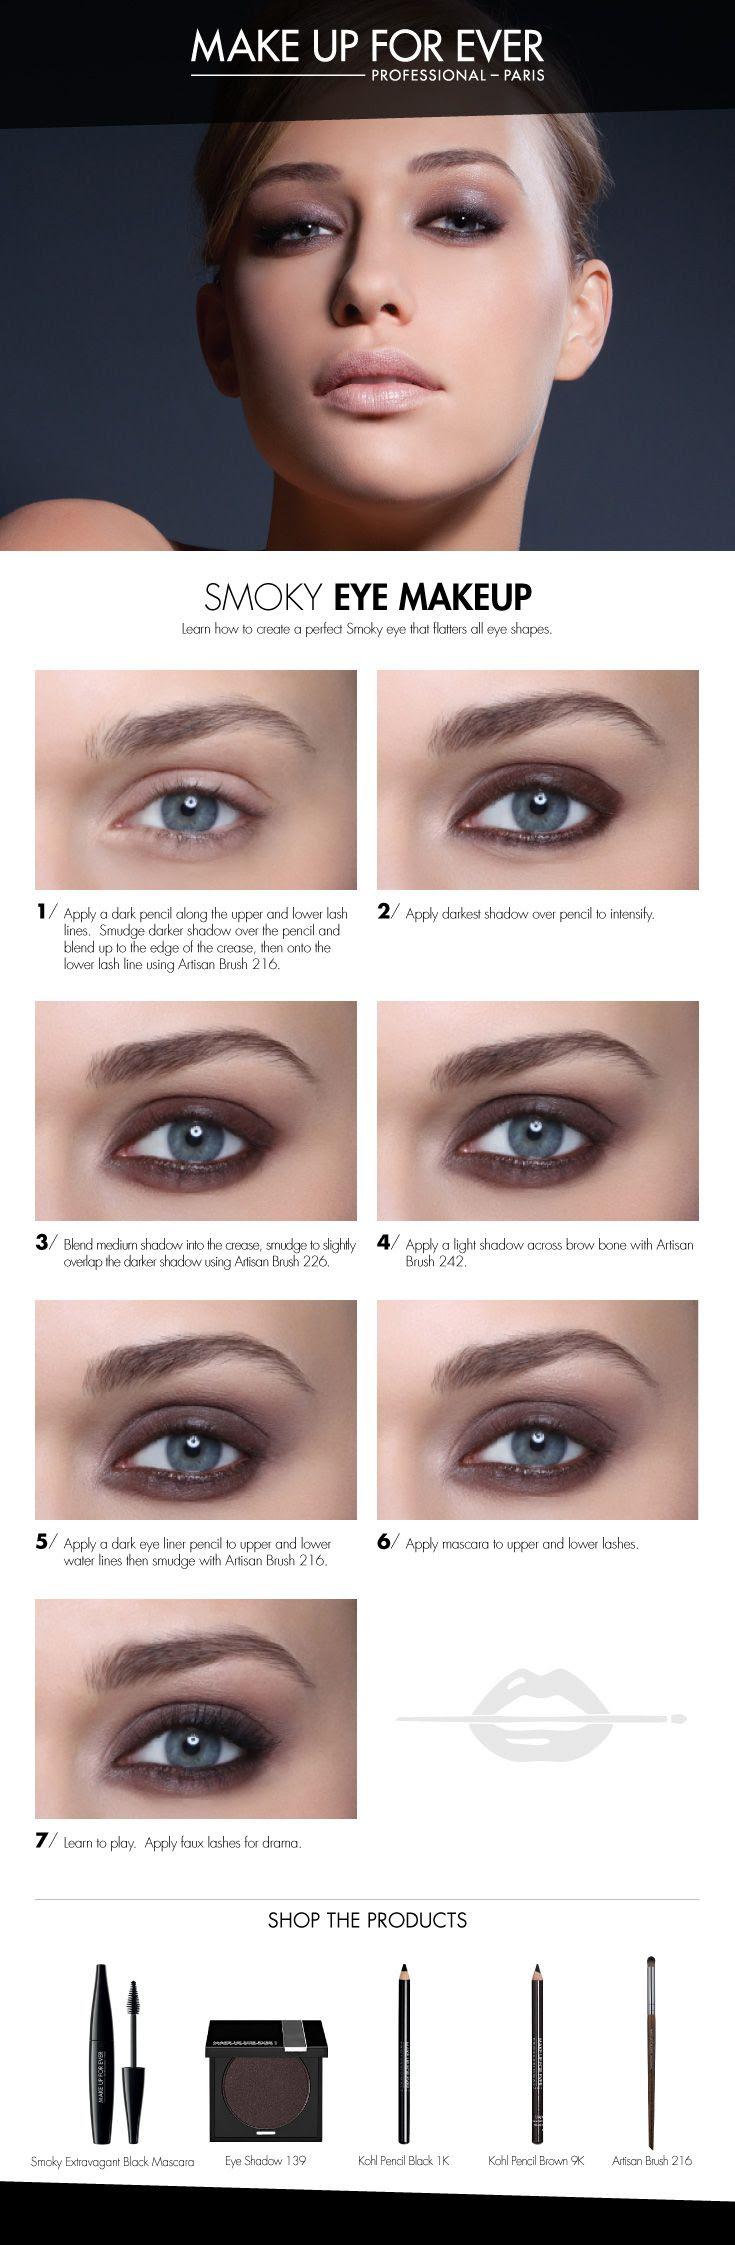 Smoky Eye Makeup #HowTo courtesy of #Makeupforever #Sephora #makeuptutorial #smokyeye